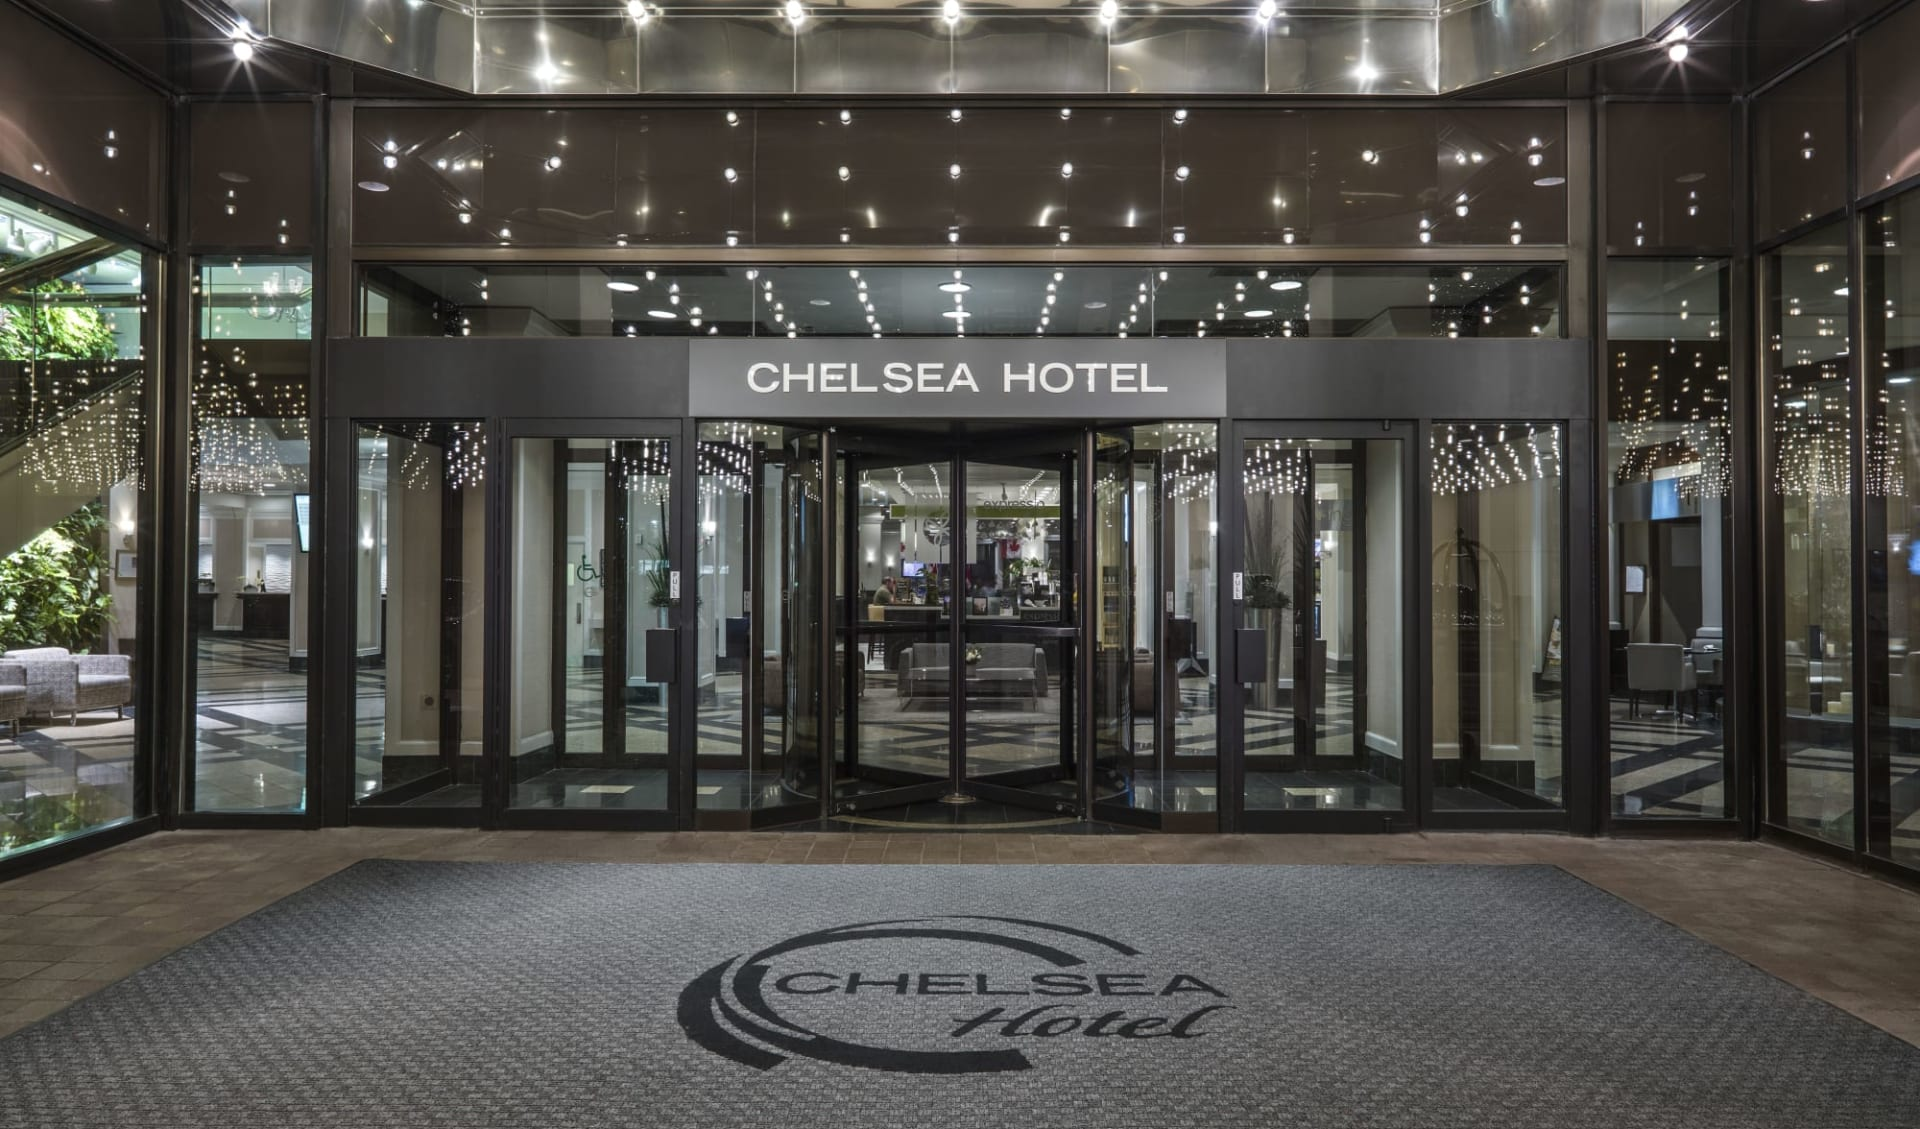 Chelsea Hotel in Toronto:  Chelsea Hotel_BayStreetEntrance